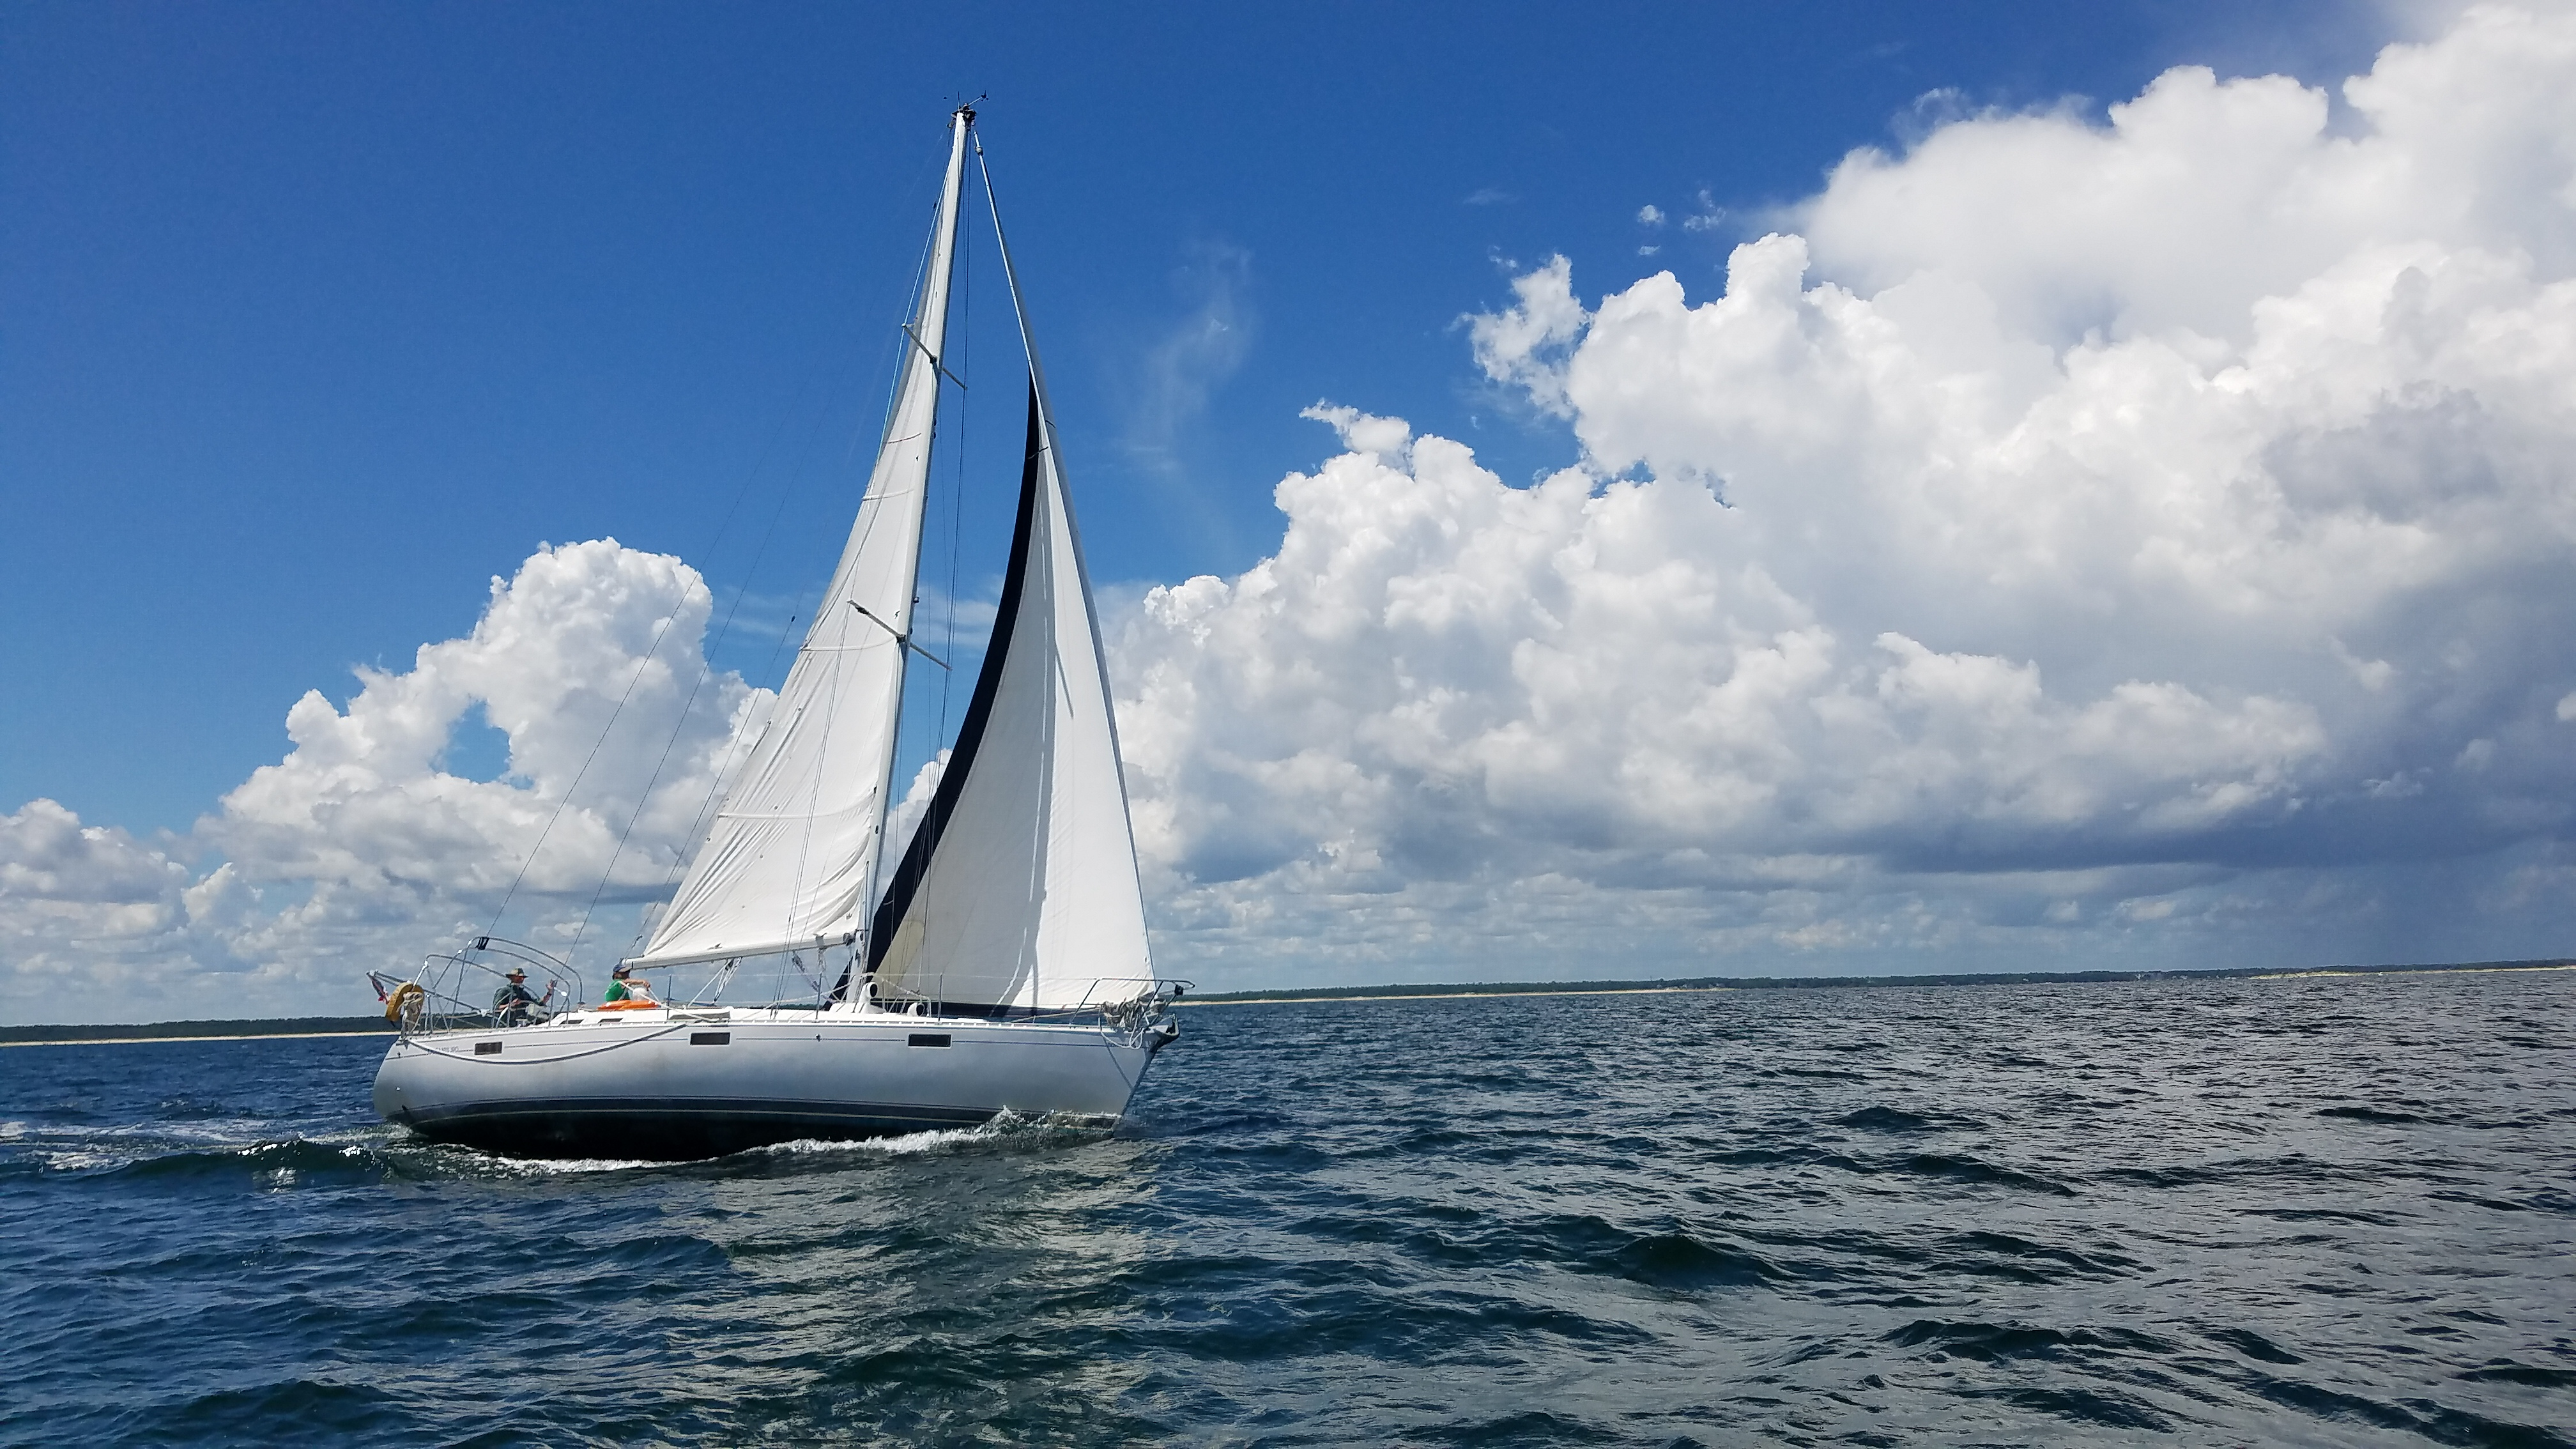 Myrtle Beach Sailing School Asa Sailing Lessons